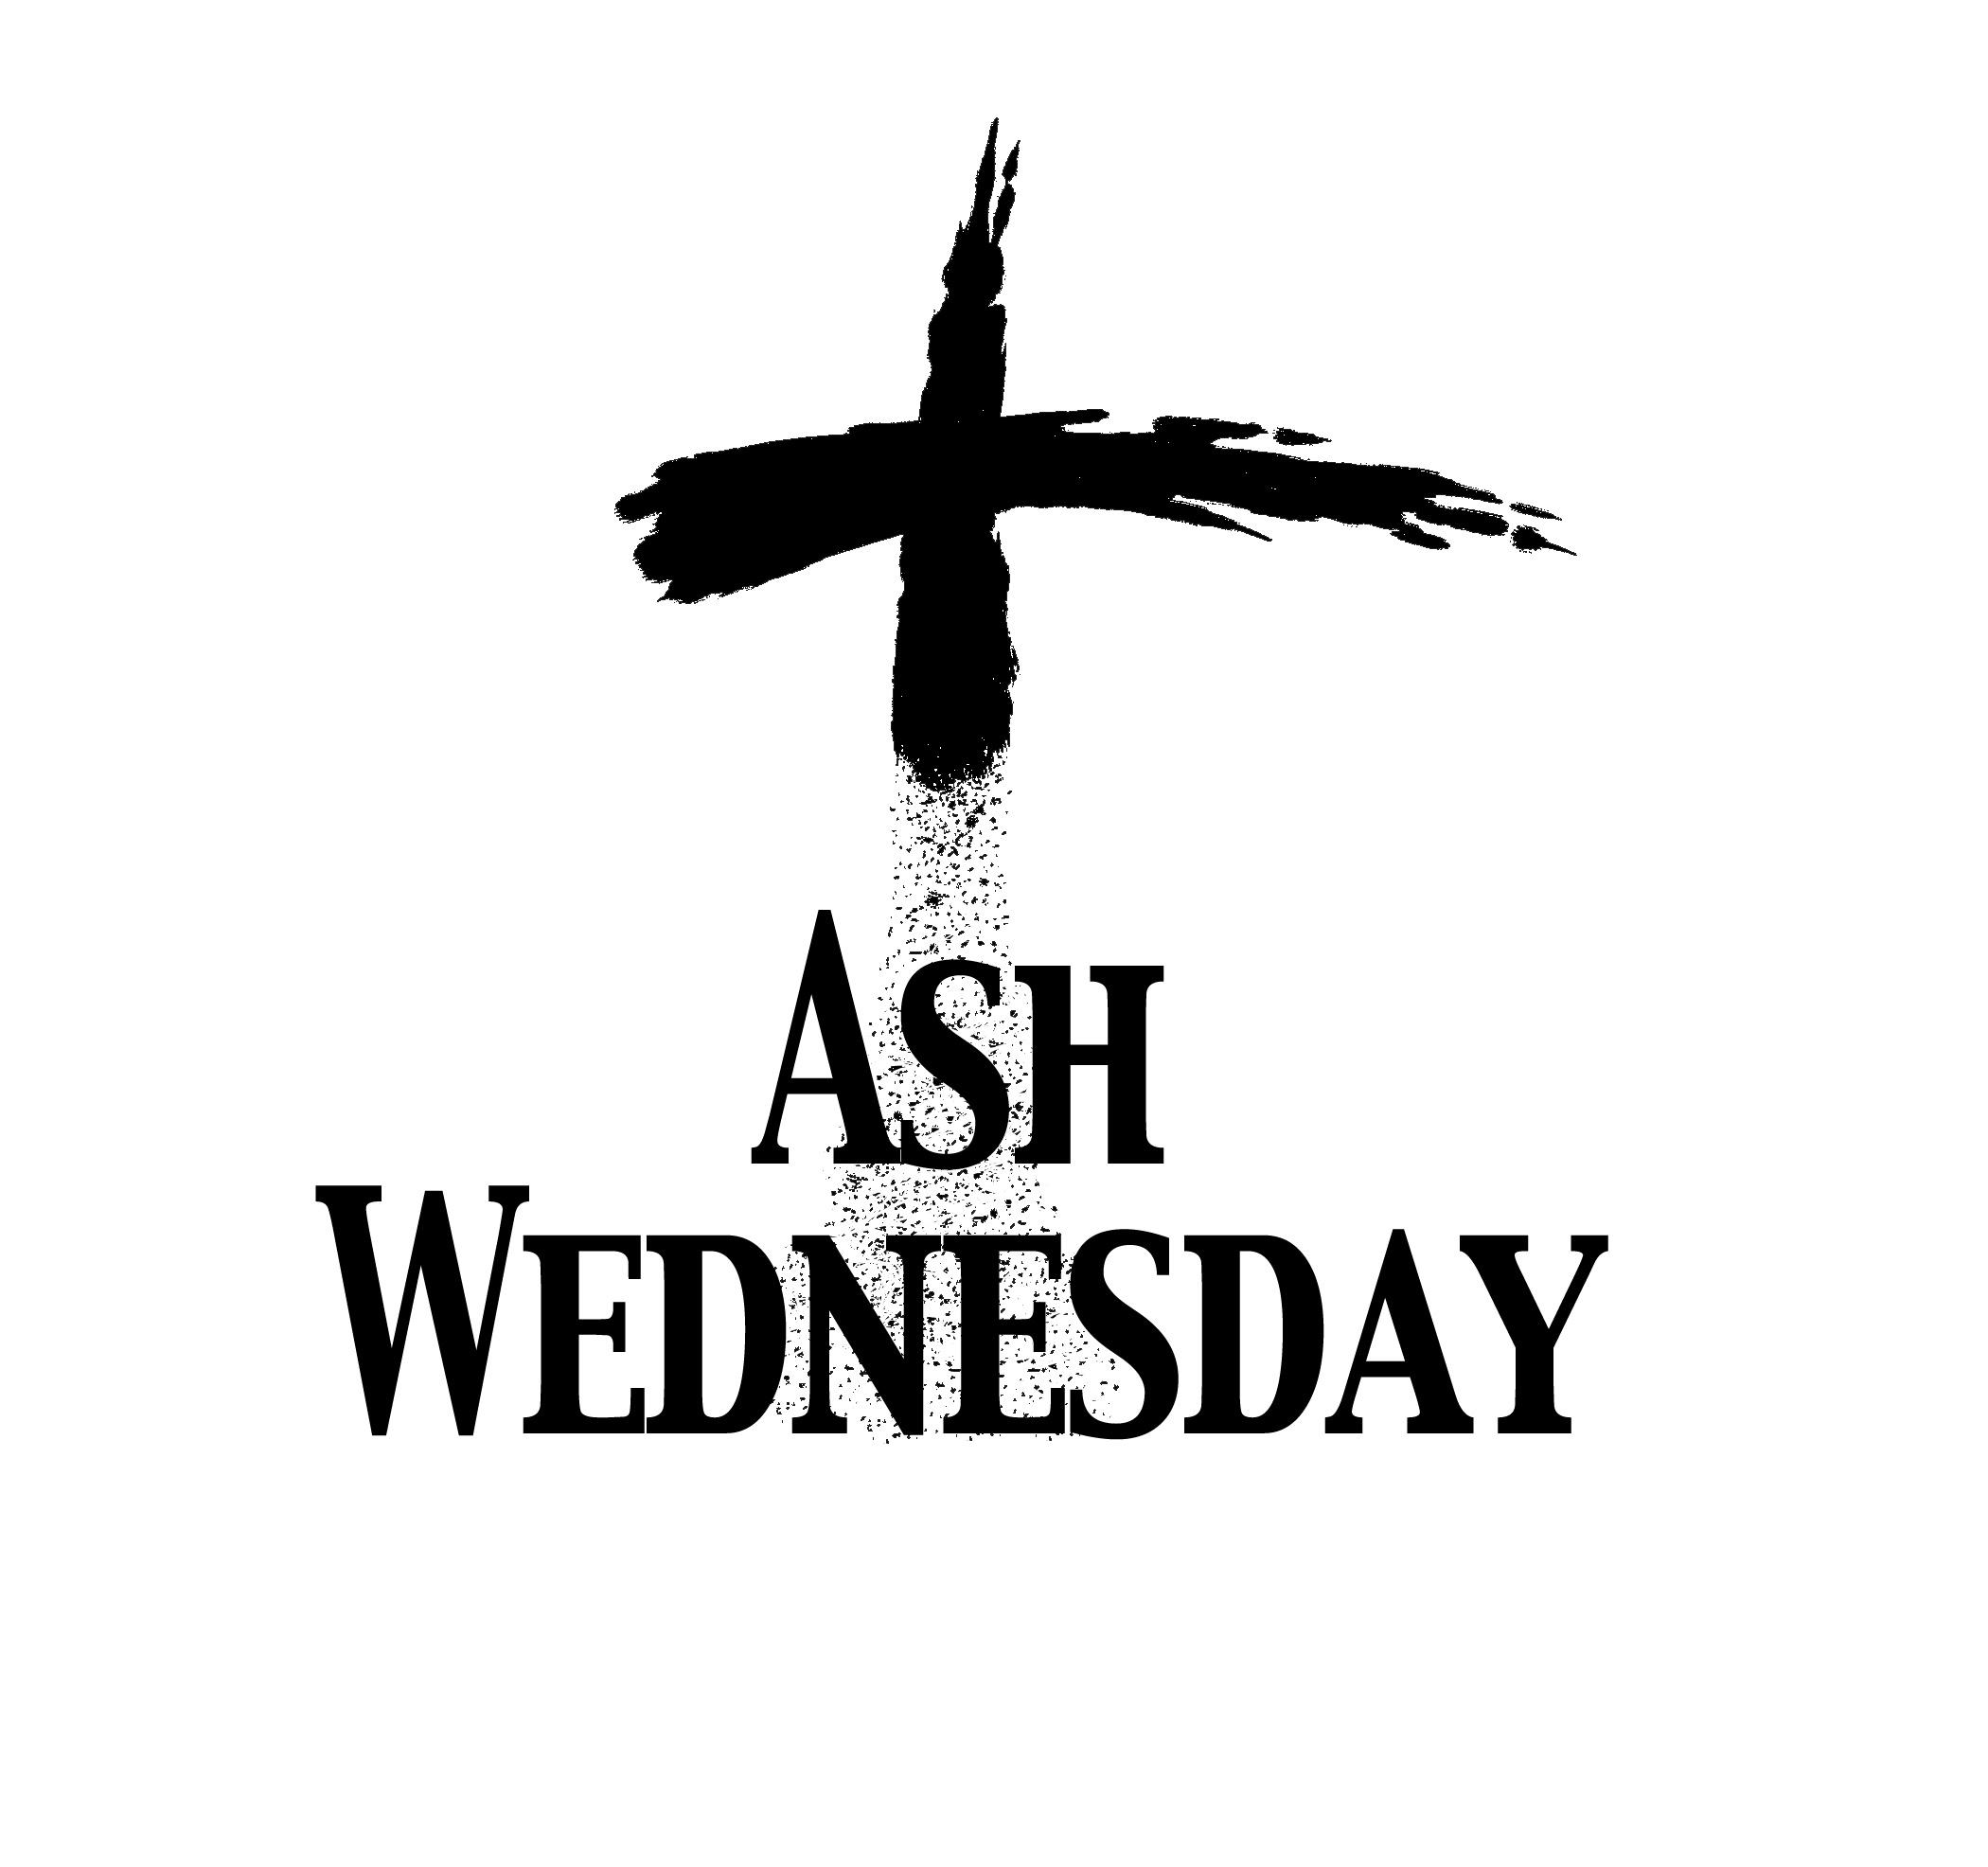 ,wishbone ash,ash rai,daniel ash,ash tree,ash wallpapers,ash music,ash wood,ash wednesday,red ash,ash tray,ash charizard,mountain ash,ash abhishek,fire ash,ash leaf,galerians ash,sam ash,ha ash,ash leaves